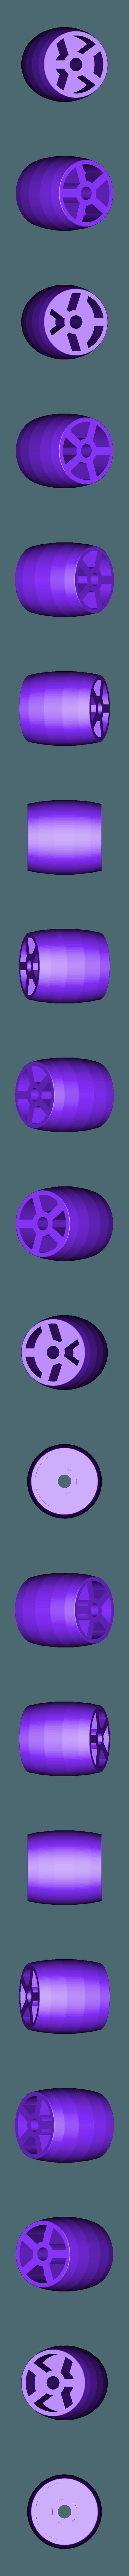 wheel_v2.stl Download free STL file Wheelie tote box kit • Model to 3D print, Sagittario